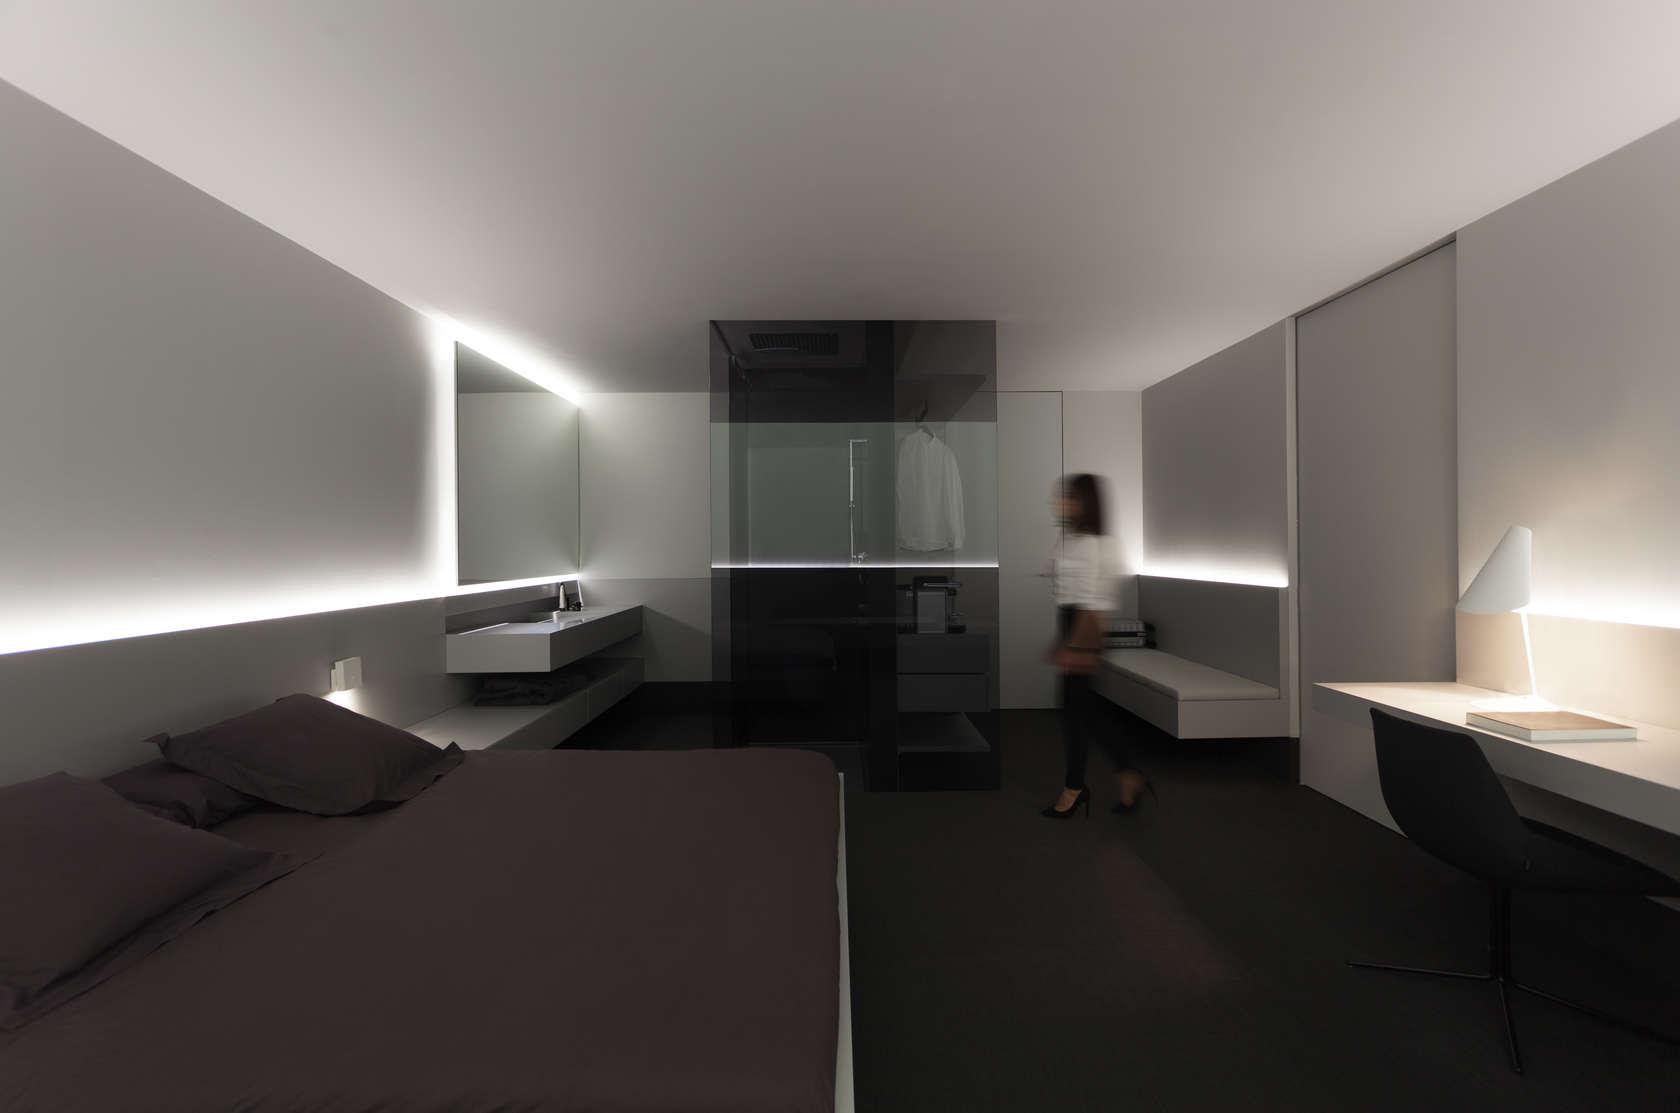 Fran silvestre arquitectos architizer - Arquitecto de interiores ...